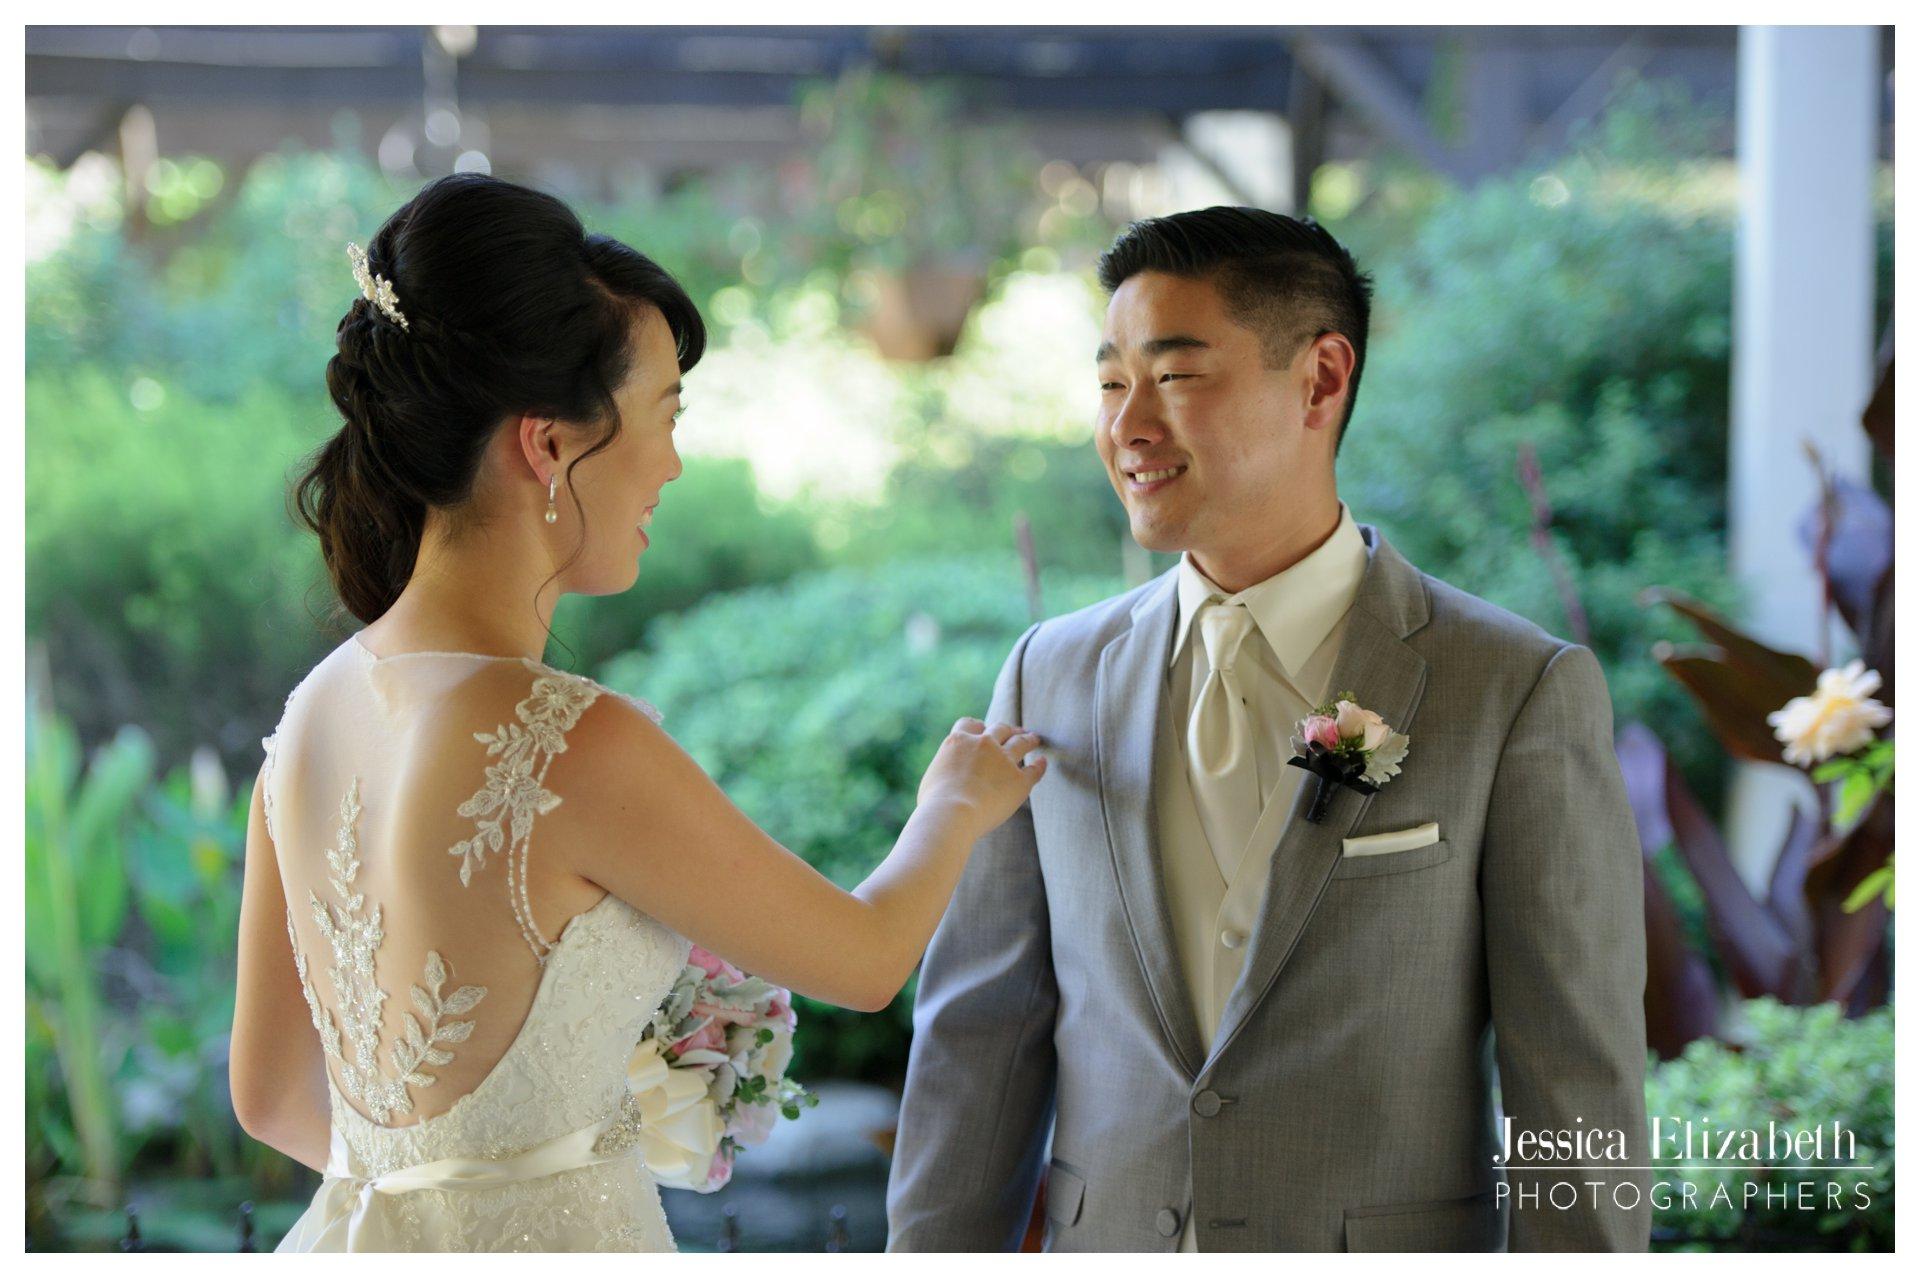 02-South-Coast-Botanic-Garden-Palos-Verdes-Wedding-Photography-by-Jessica-Elizabeth.jpg